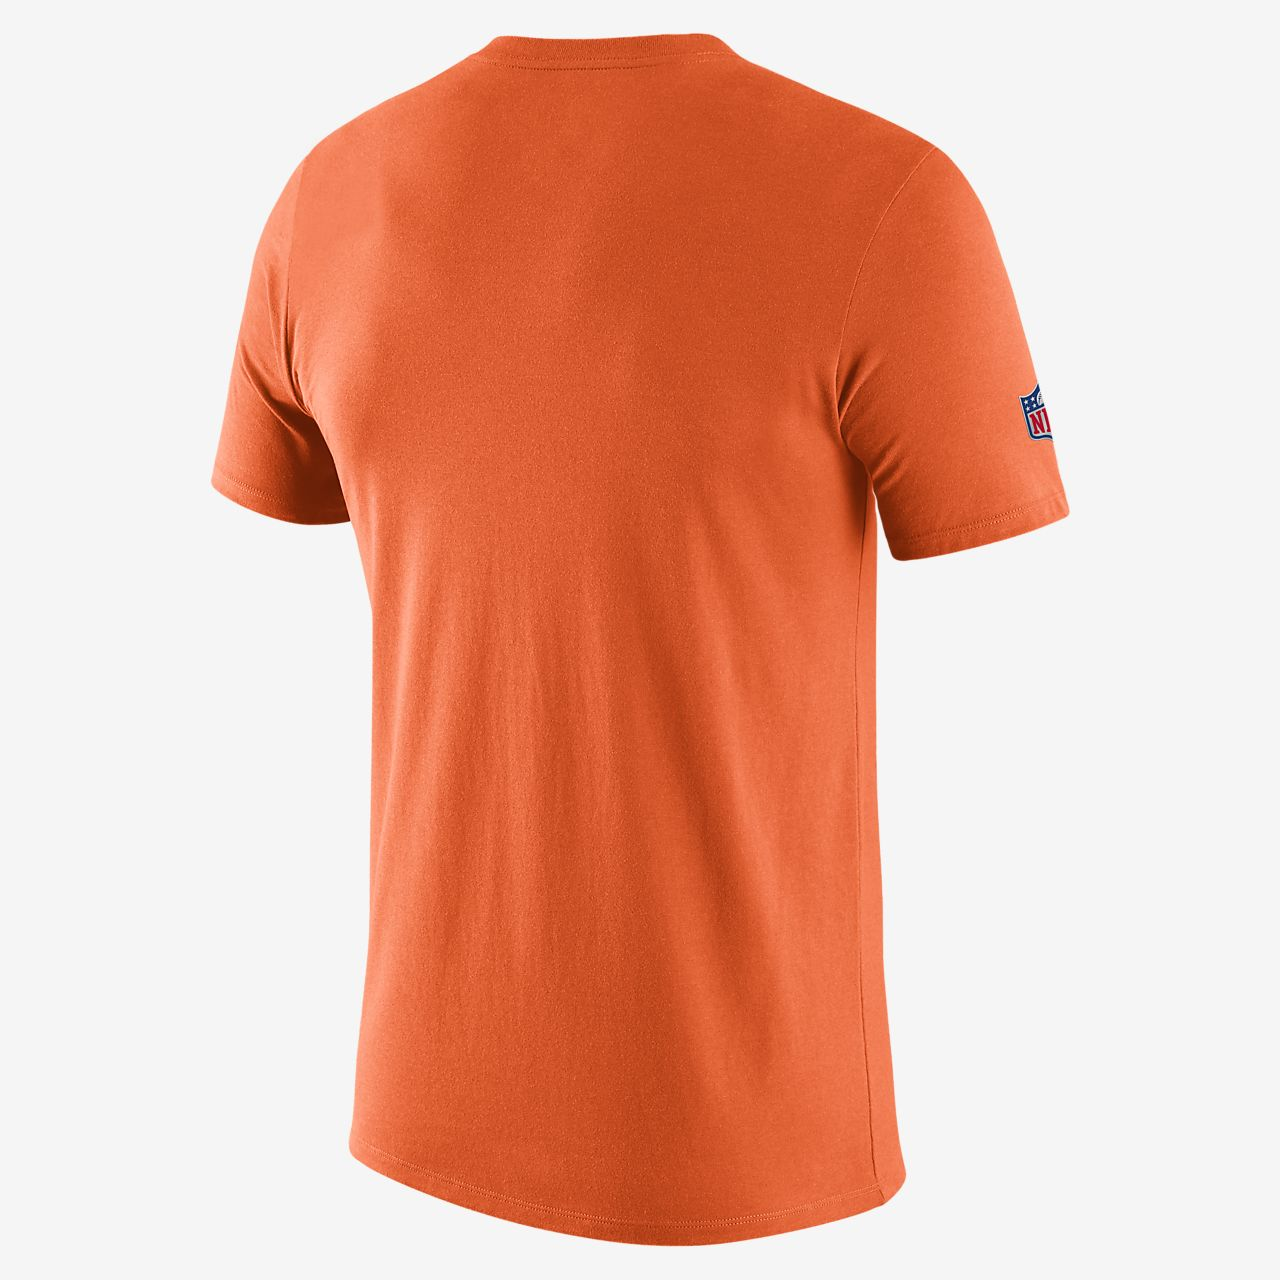 sous pull manche longue homme nike orange